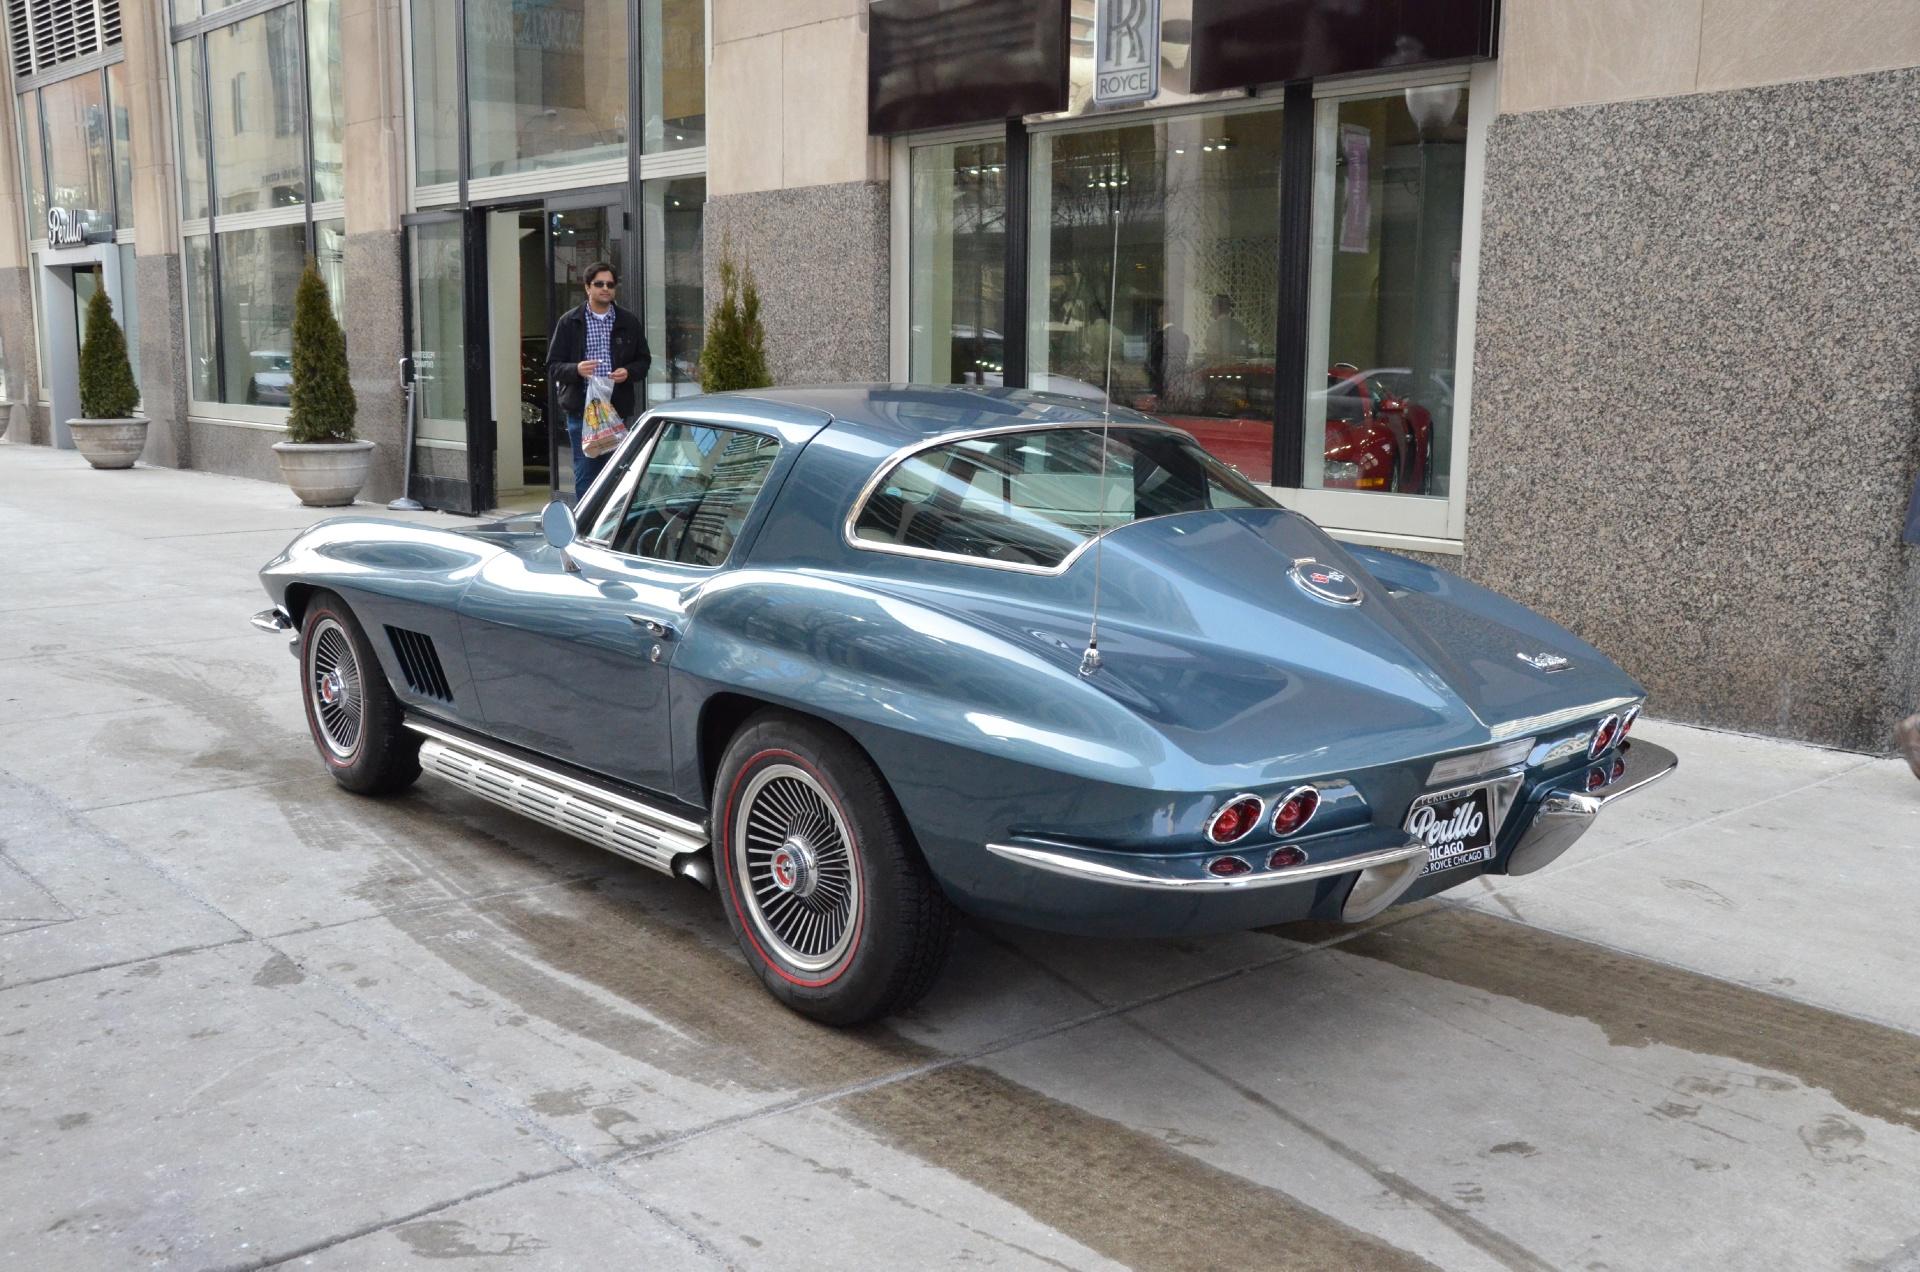 1967 chevrolet corvette stingray stock 07846 for sale near chicago il il chevrolet dealer. Black Bedroom Furniture Sets. Home Design Ideas